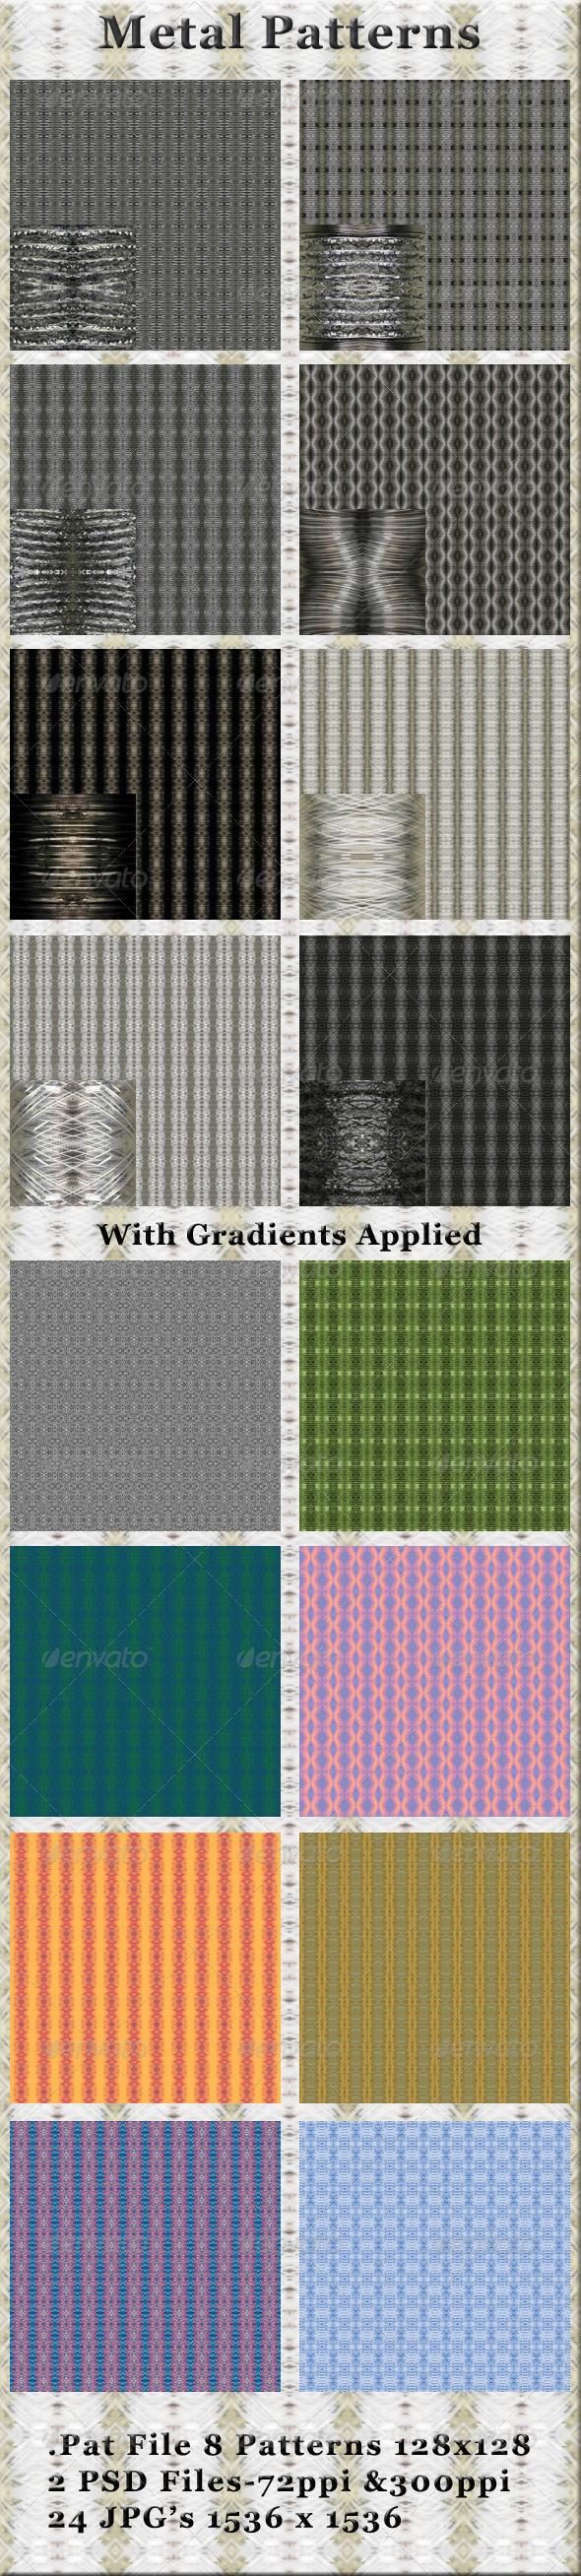 GraphicRiver 8 Metal Patterns 4367580